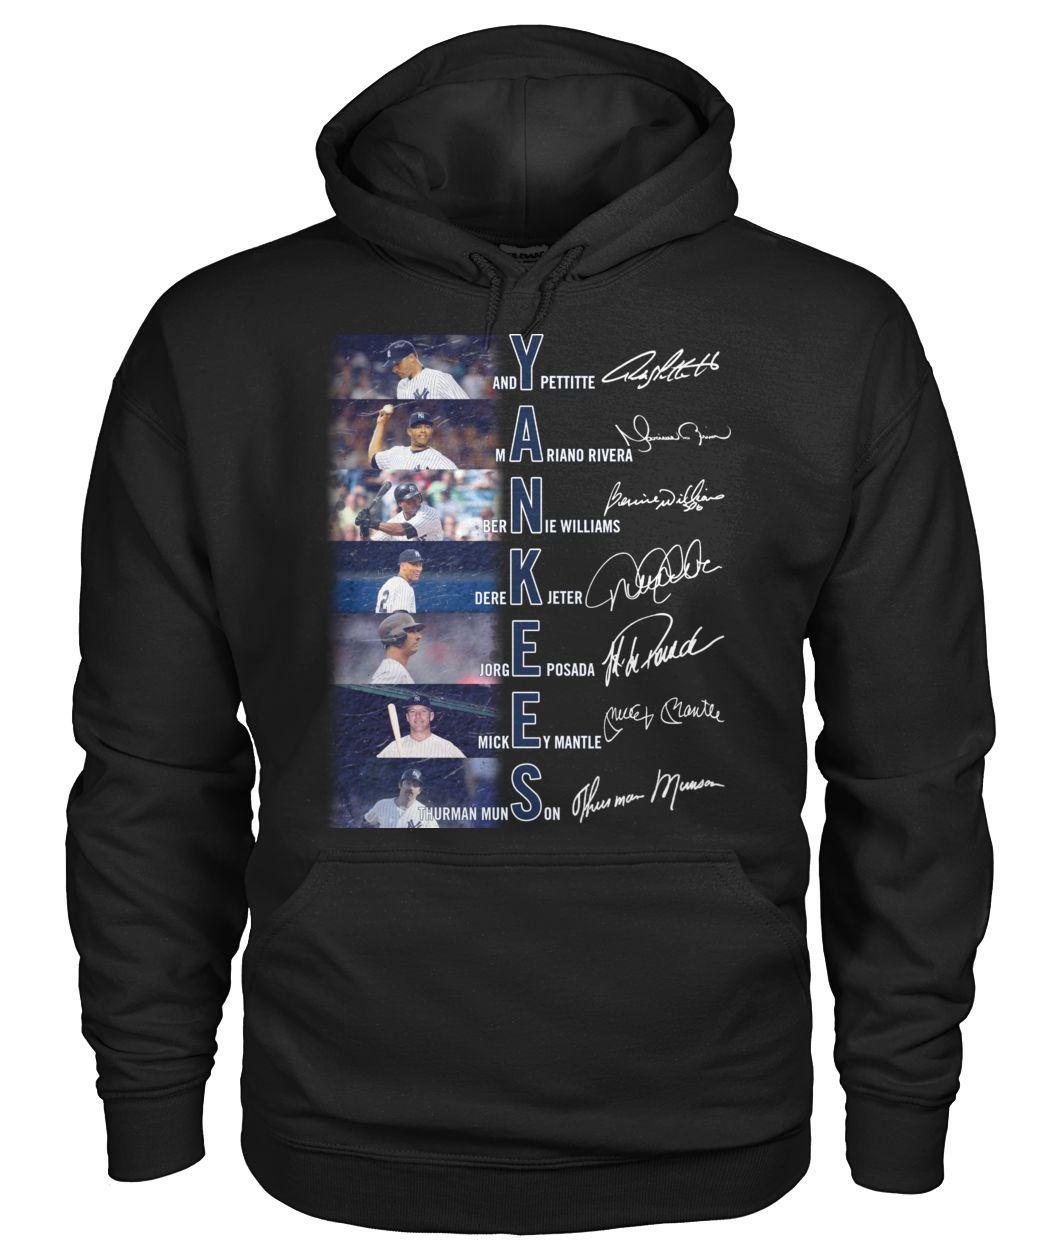 Yankees Andy Pettitte Mariand Rivera Bernie Williams Derek Jeter signature hoodie